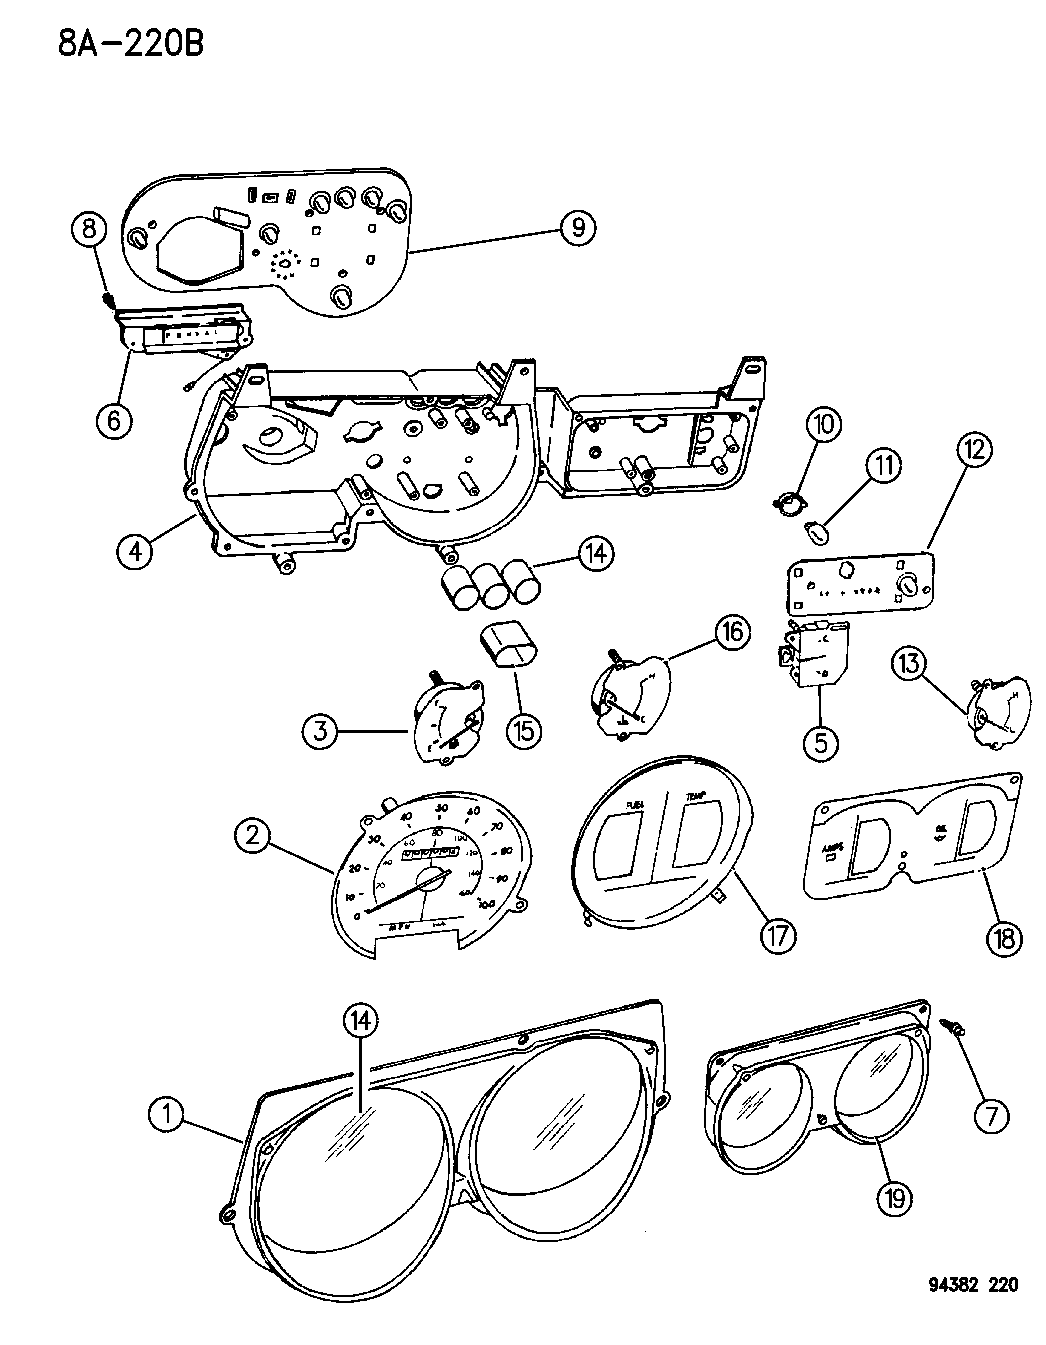 1996 Dodge B3500 Wiring Diagram